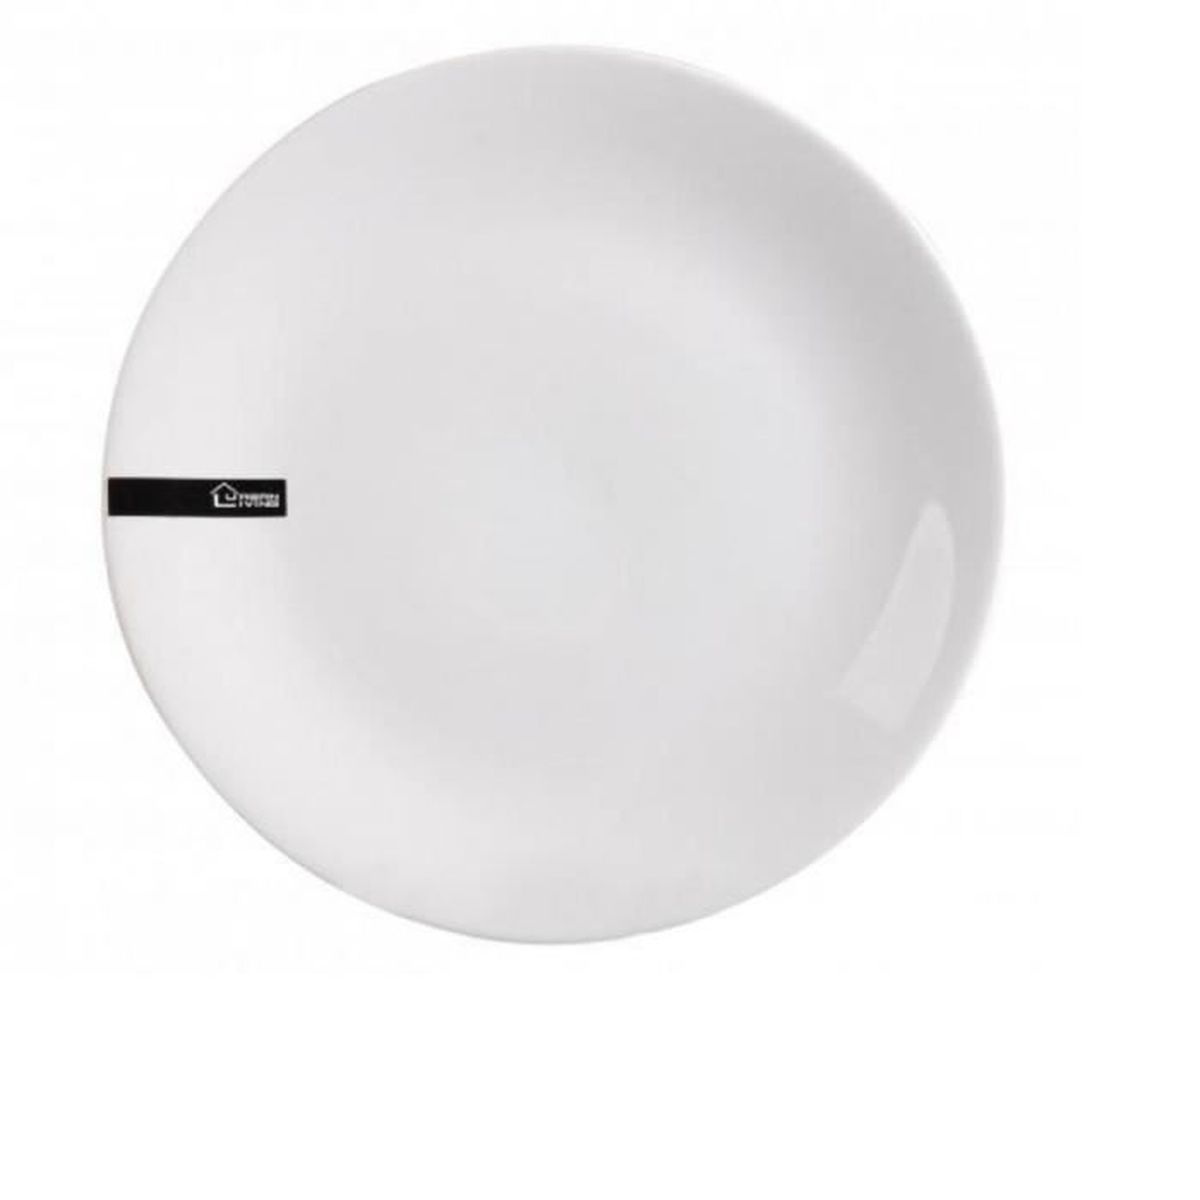 assiette plate 25 cm. Black Bedroom Furniture Sets. Home Design Ideas